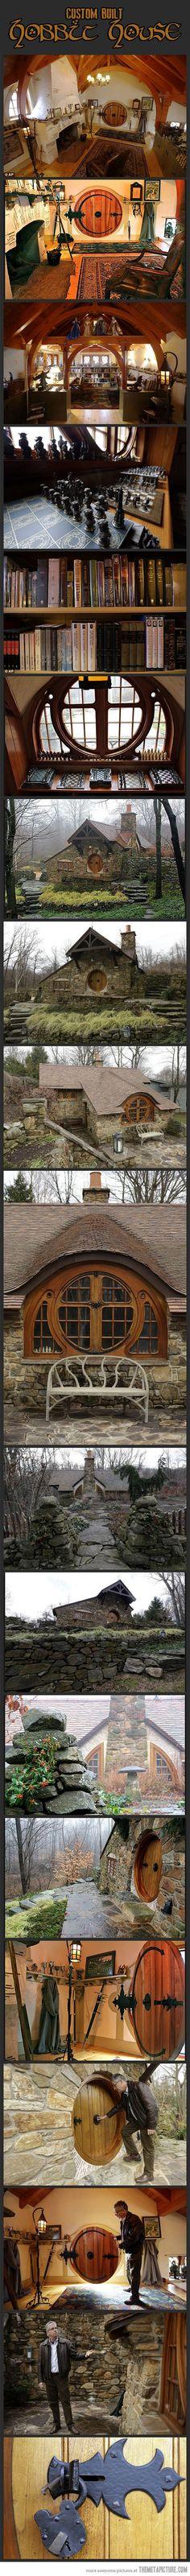 Custom built Hobbit house